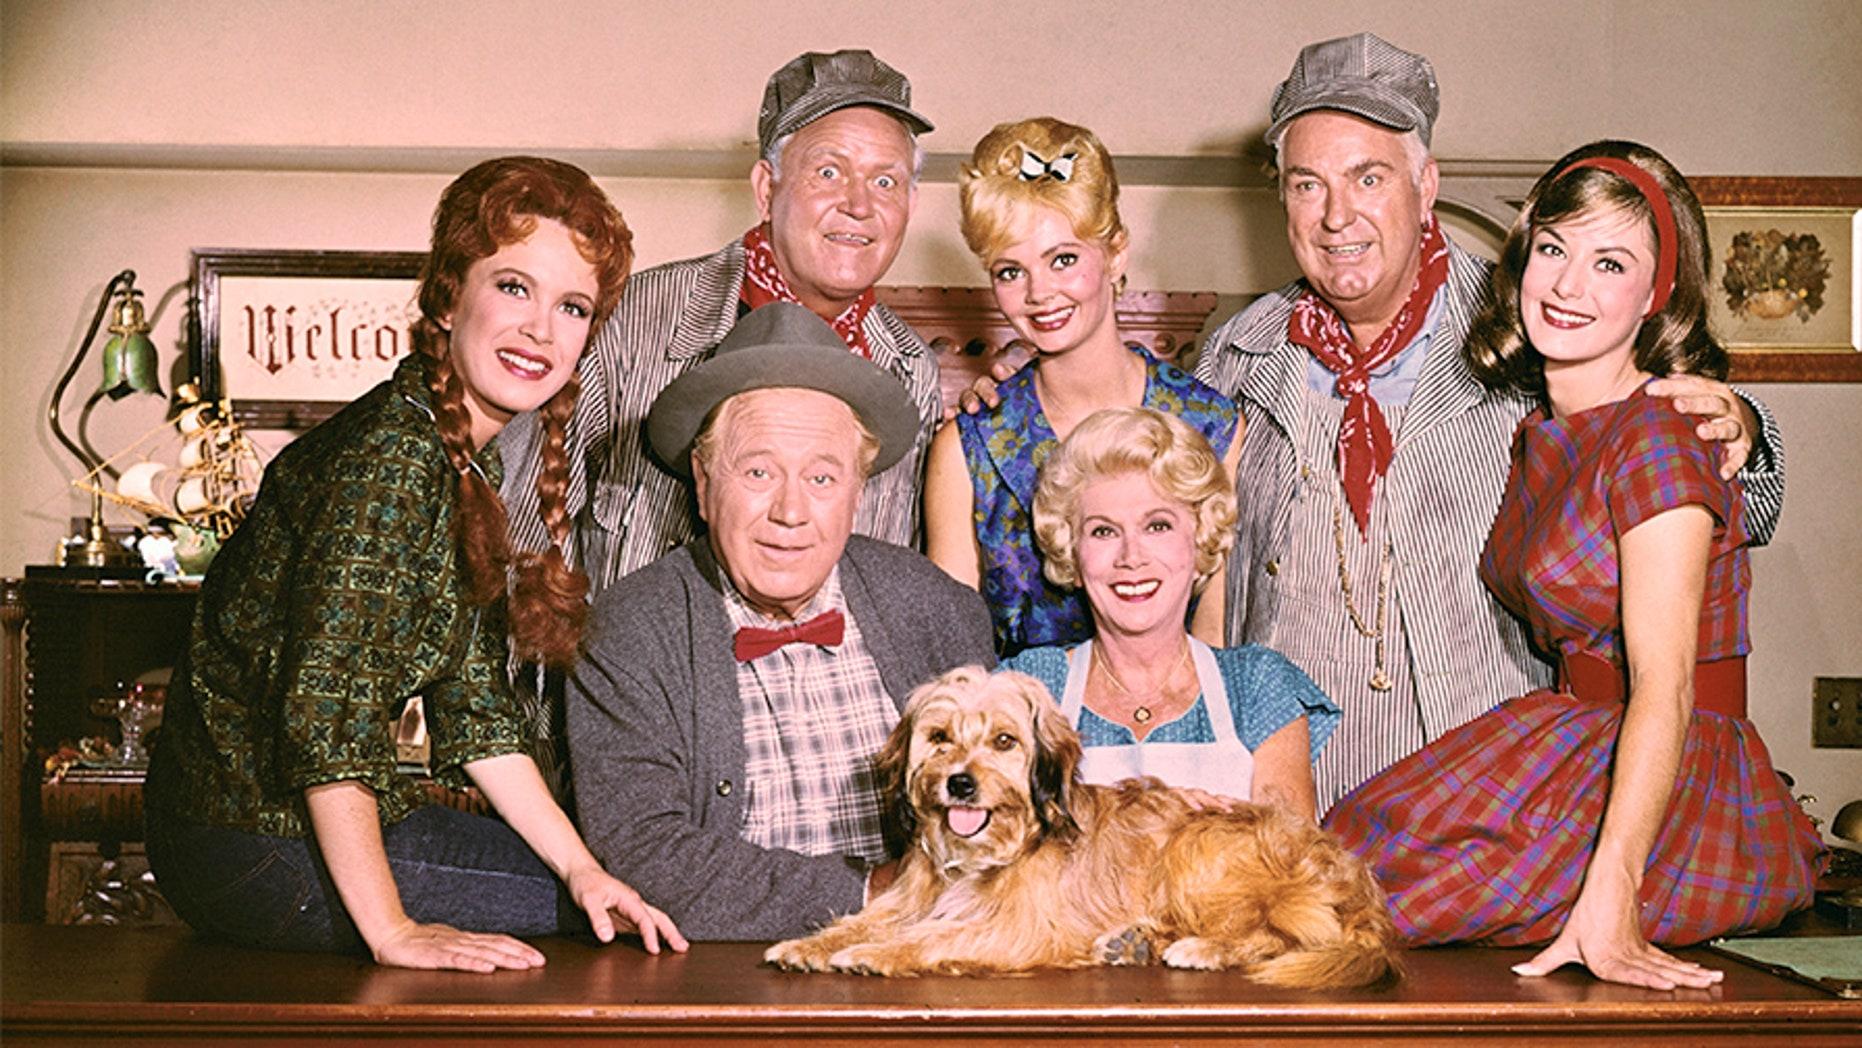 Front row: Linda Henning, Edgar Buchanan, Bea Benaderet, Lori Saunders. Back row: Rufus Davis, Jeannine Riley, Smiley Burnette.